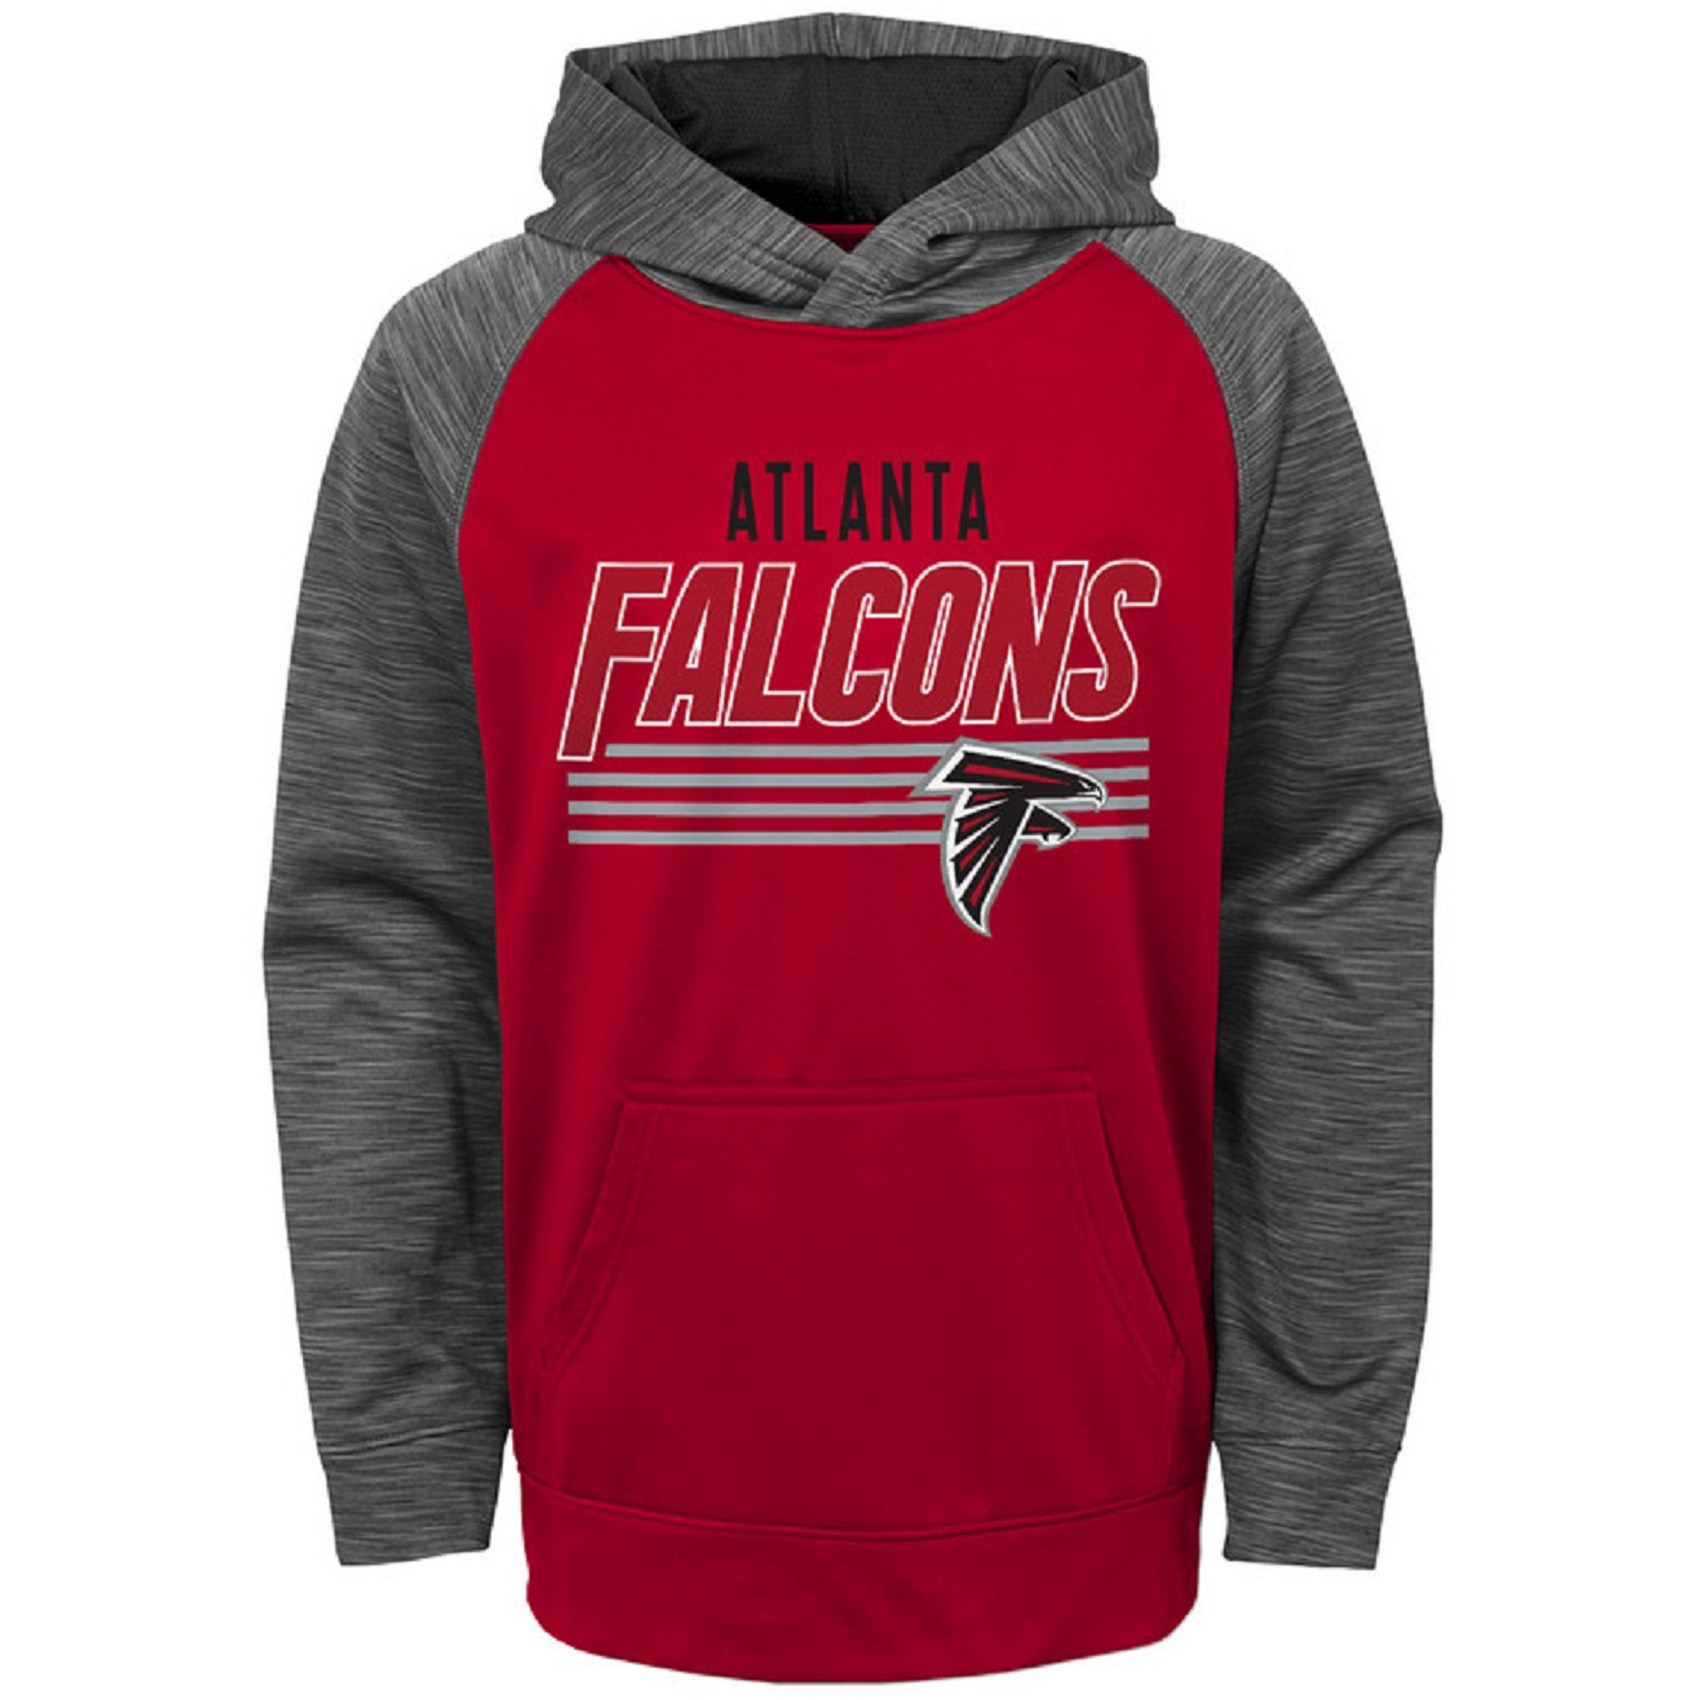 Toddler Red Atlanta Falcons Fleece Hoodie